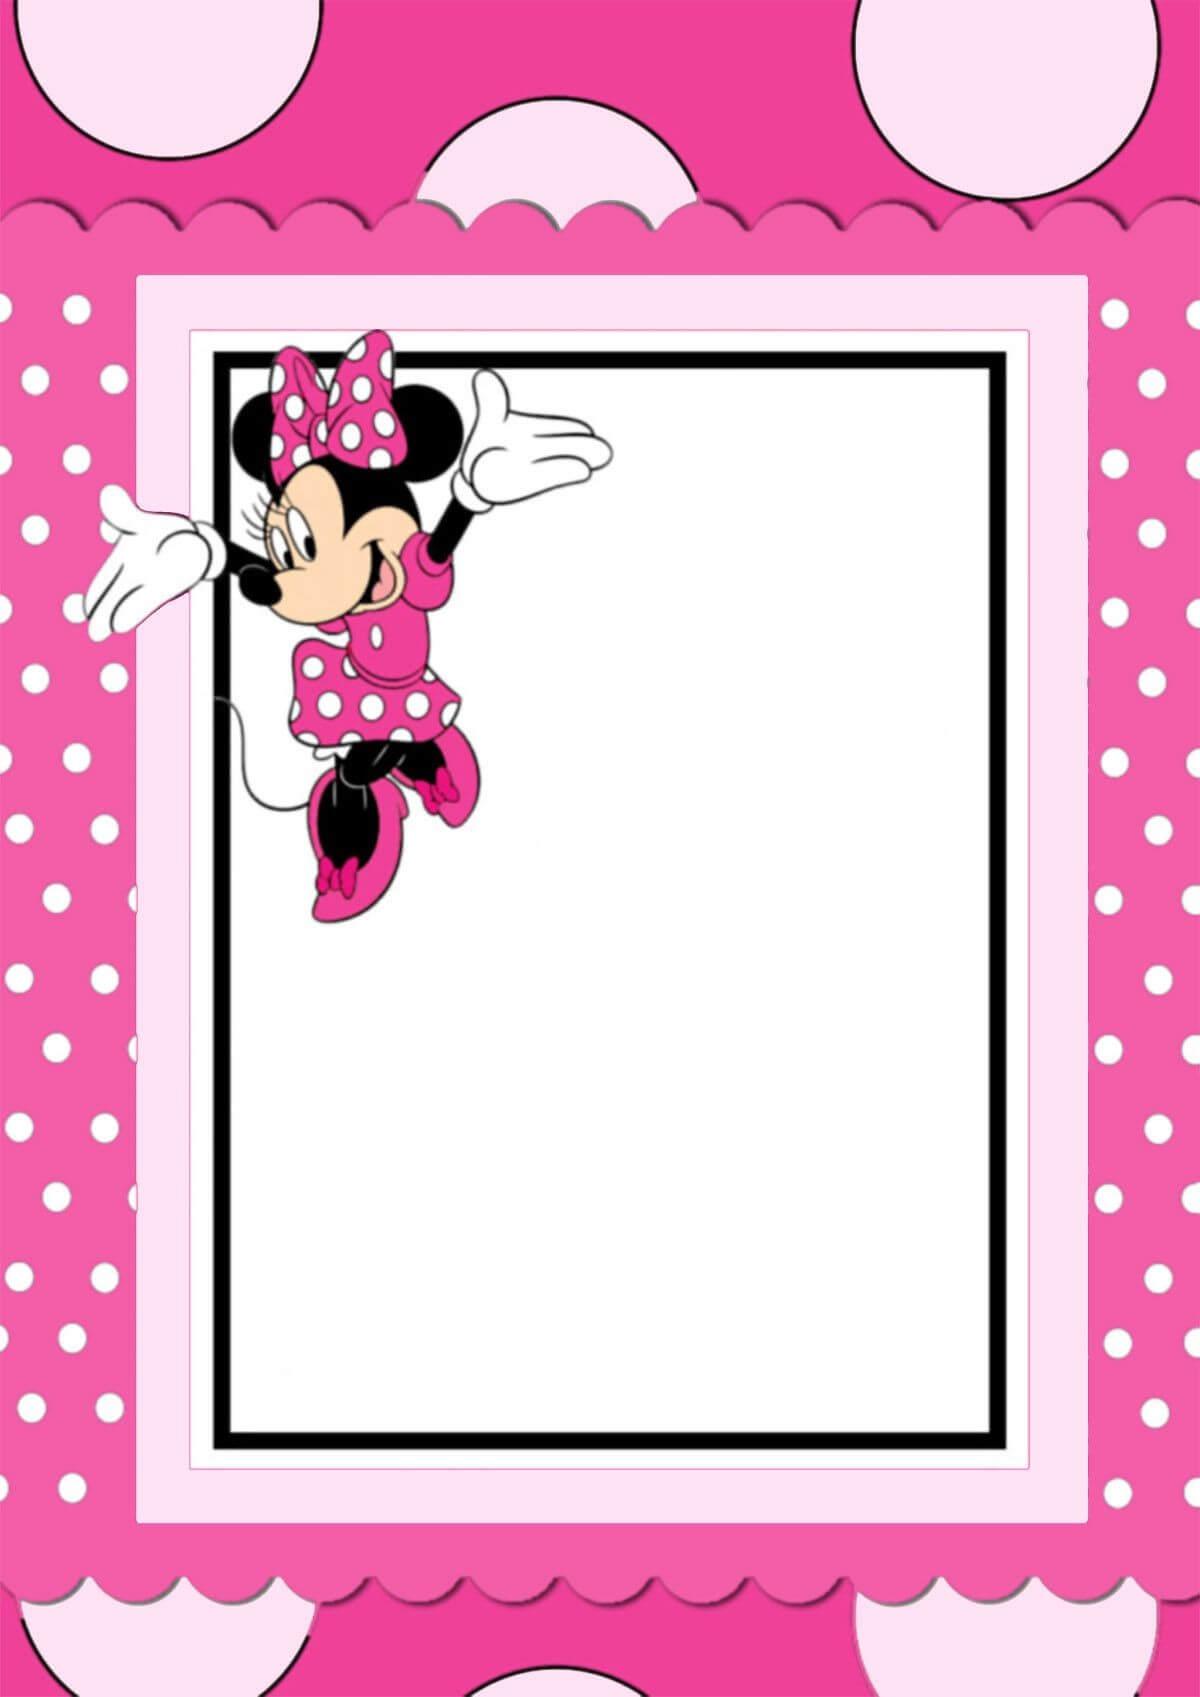 Free Printable Minnie Mouse Invitation Card | Free Regarding Minnie Mouse Card Templates